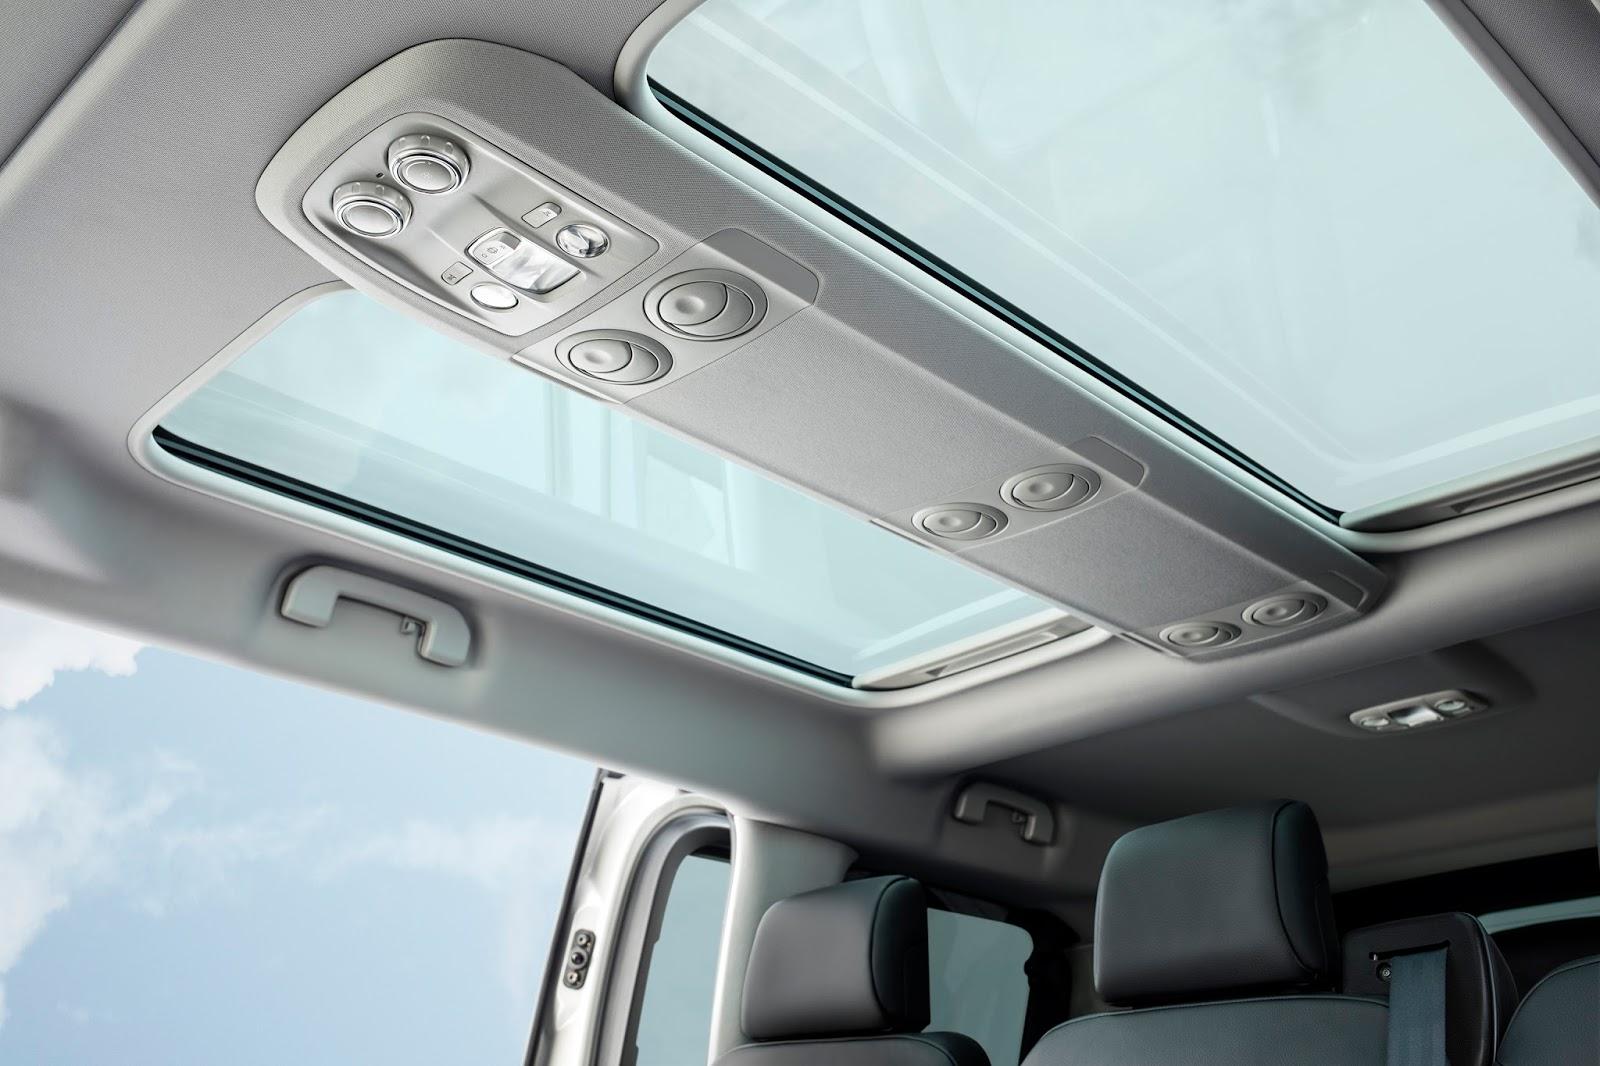 Copie%2Bde%2BCL%2B16.010.021 Με 5 Παγκόσμιες Πρεμιέρες η Citroën Στο Σαλόνι Αυτοκινήτου της Γενεύης